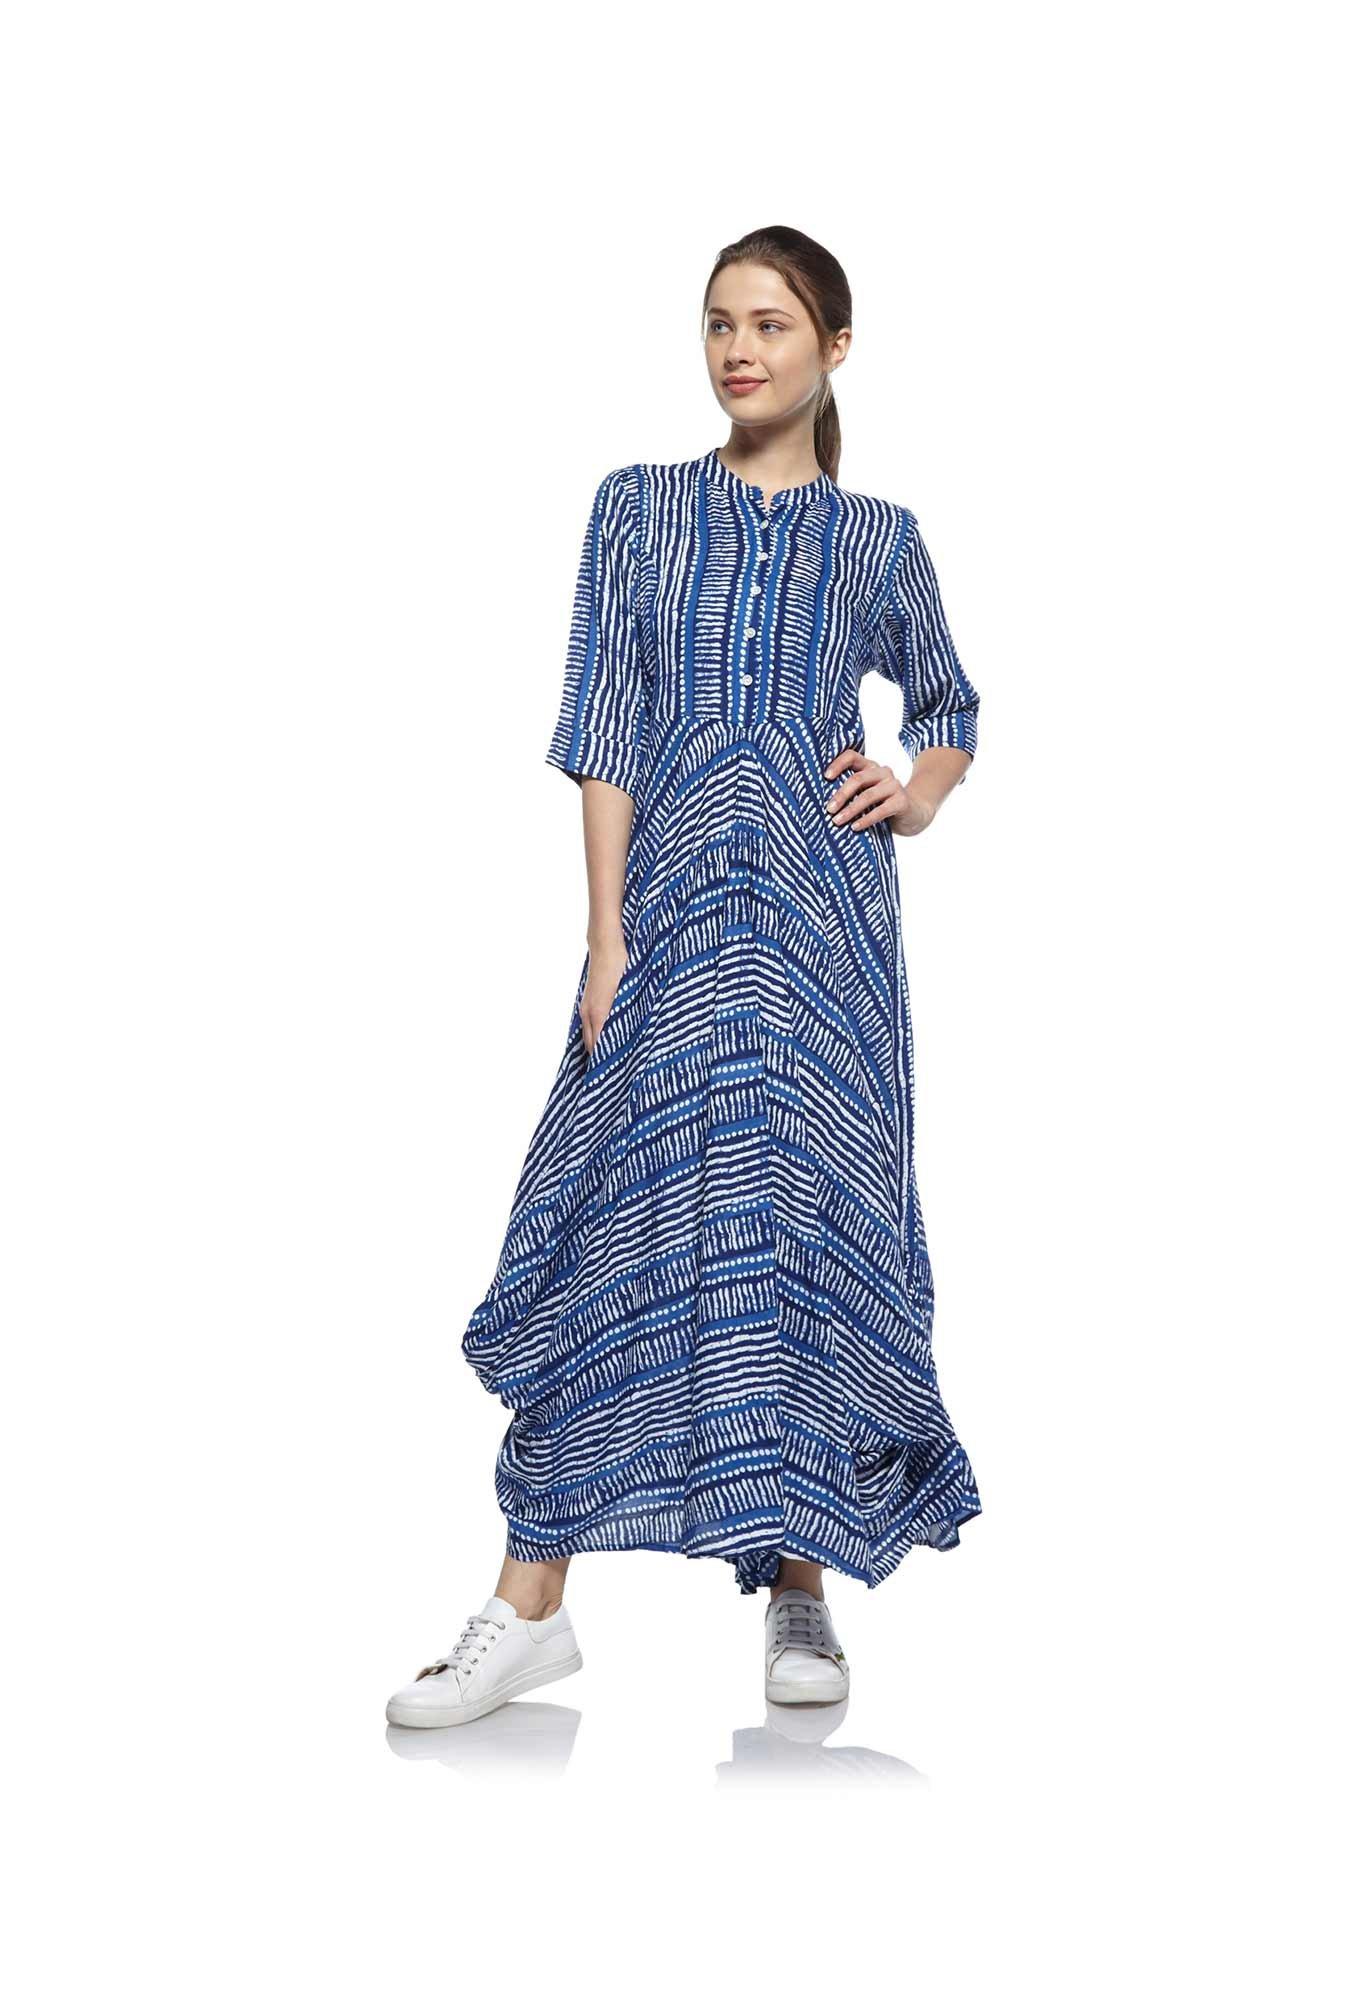 2690d23963 Buy Ethnic Maxi Dresses Online India – DACC